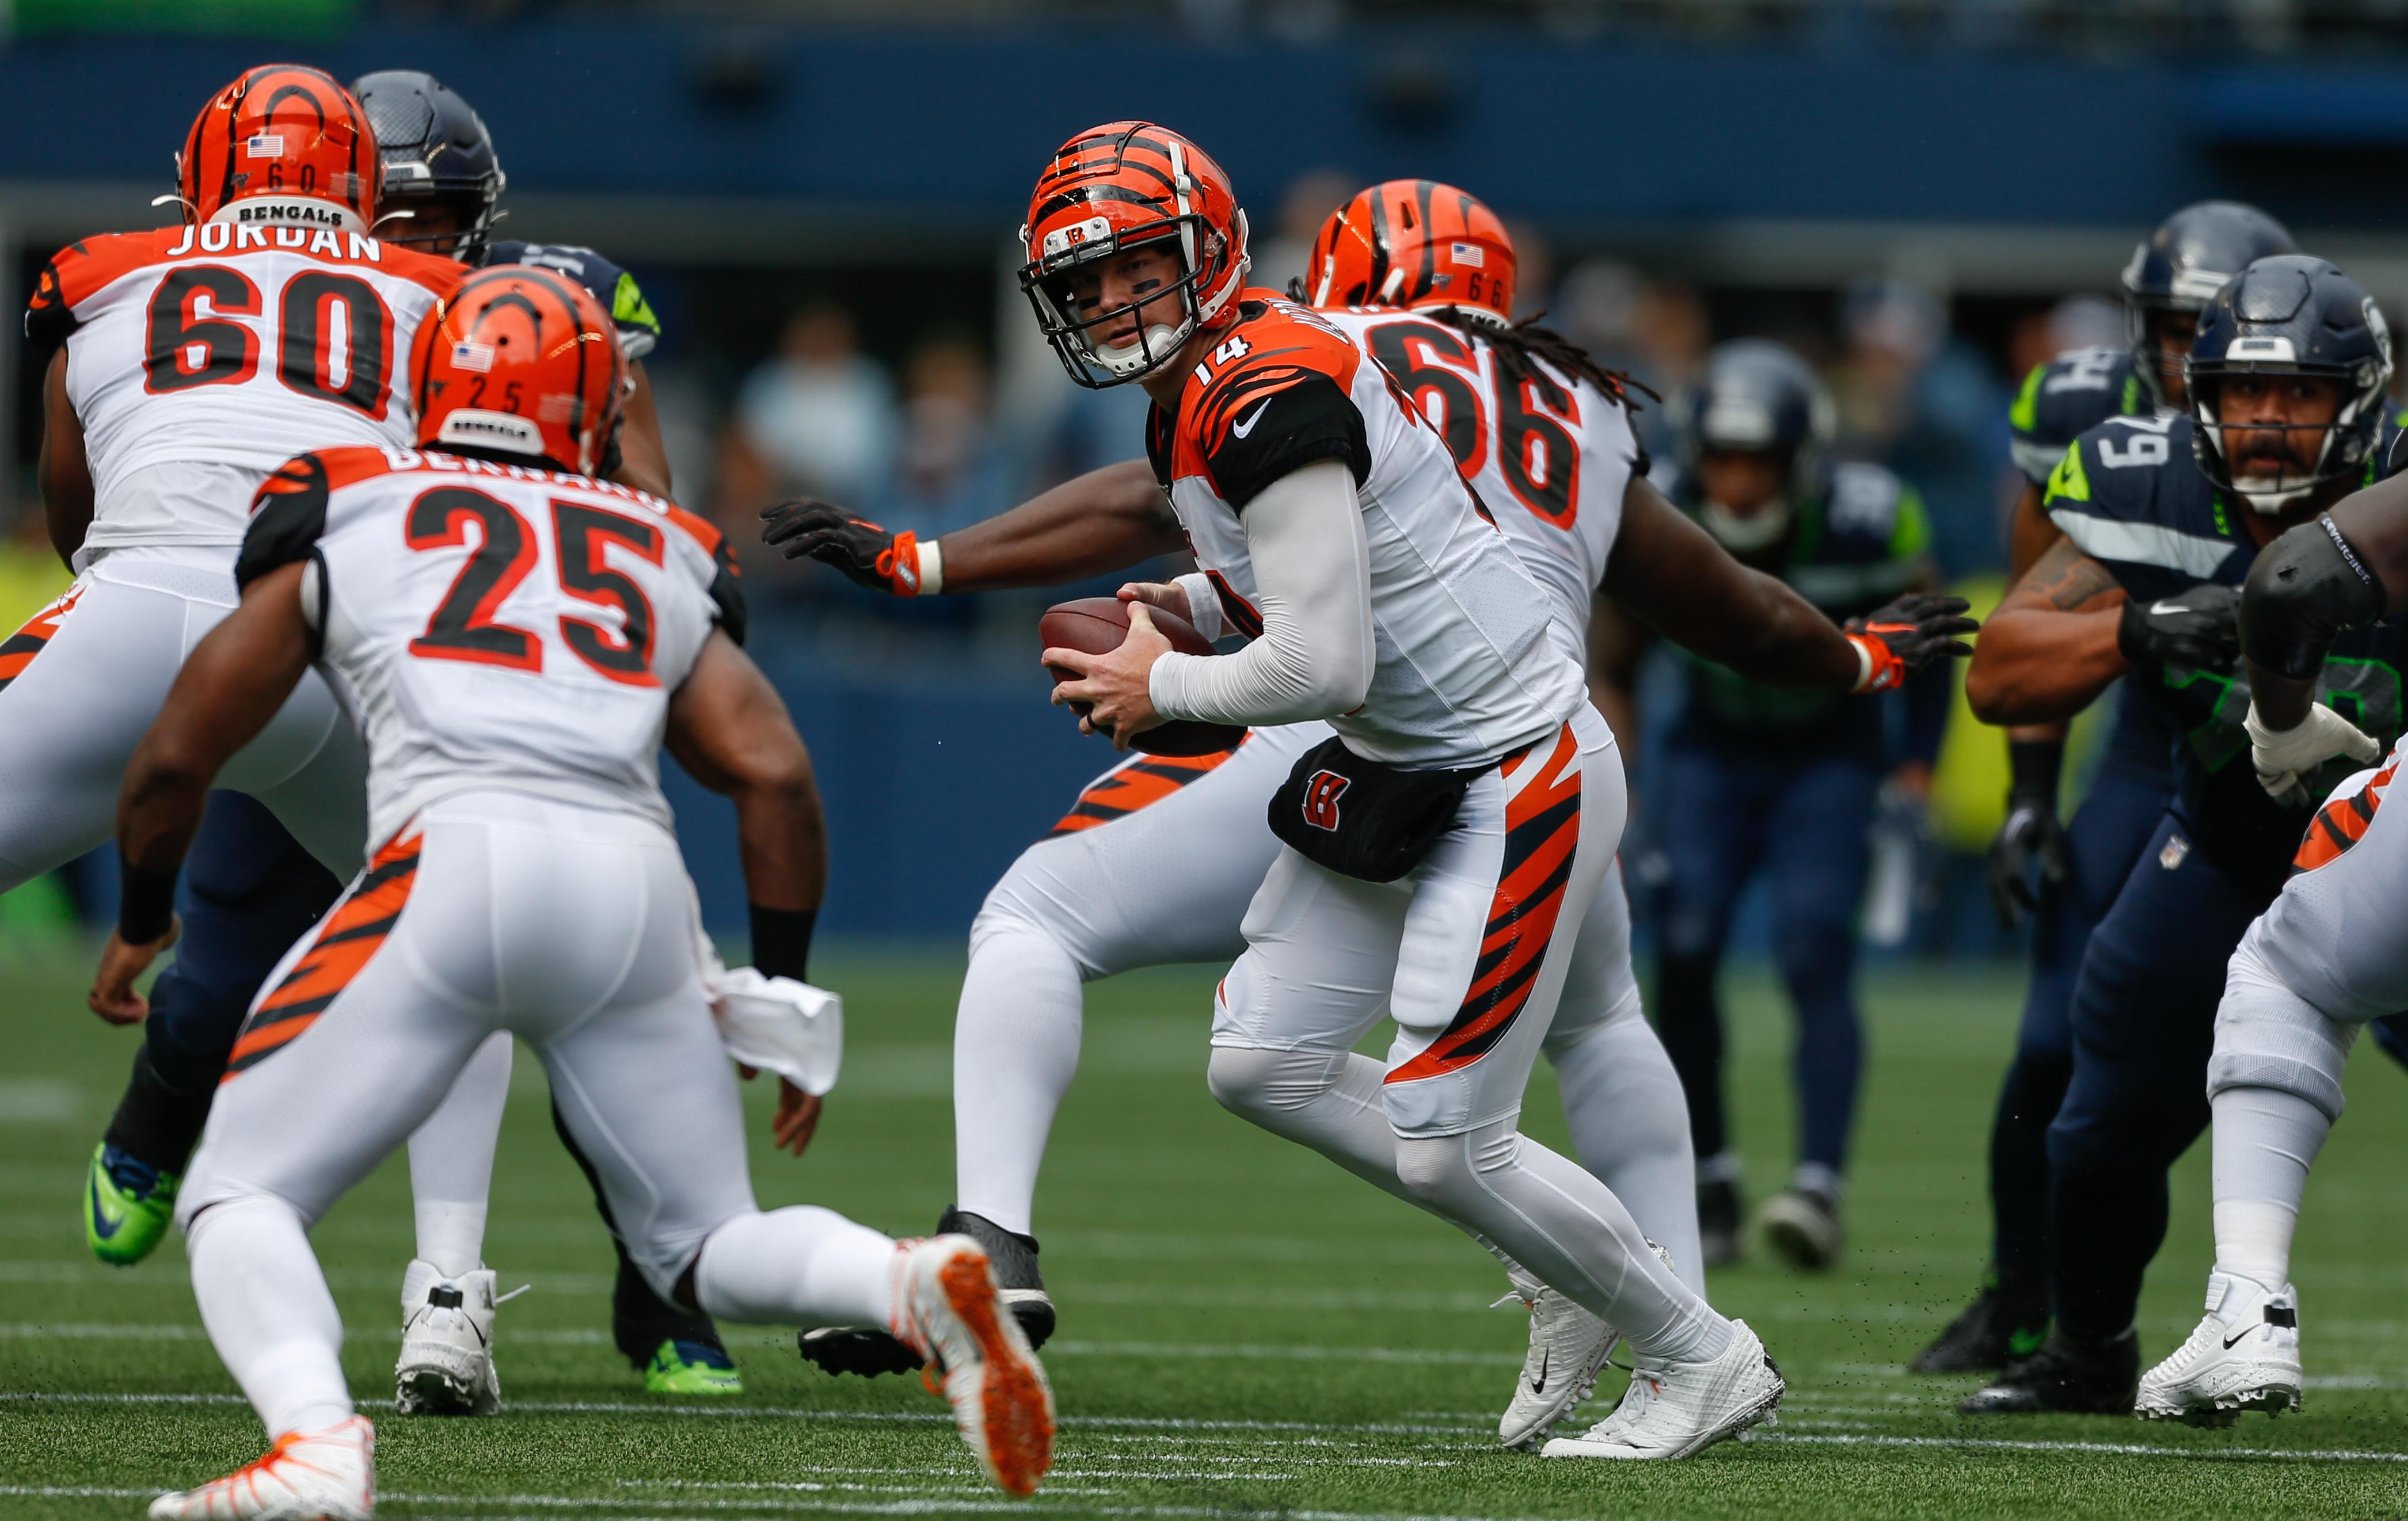 Cincinnati Bengals vSeattle Seahawks